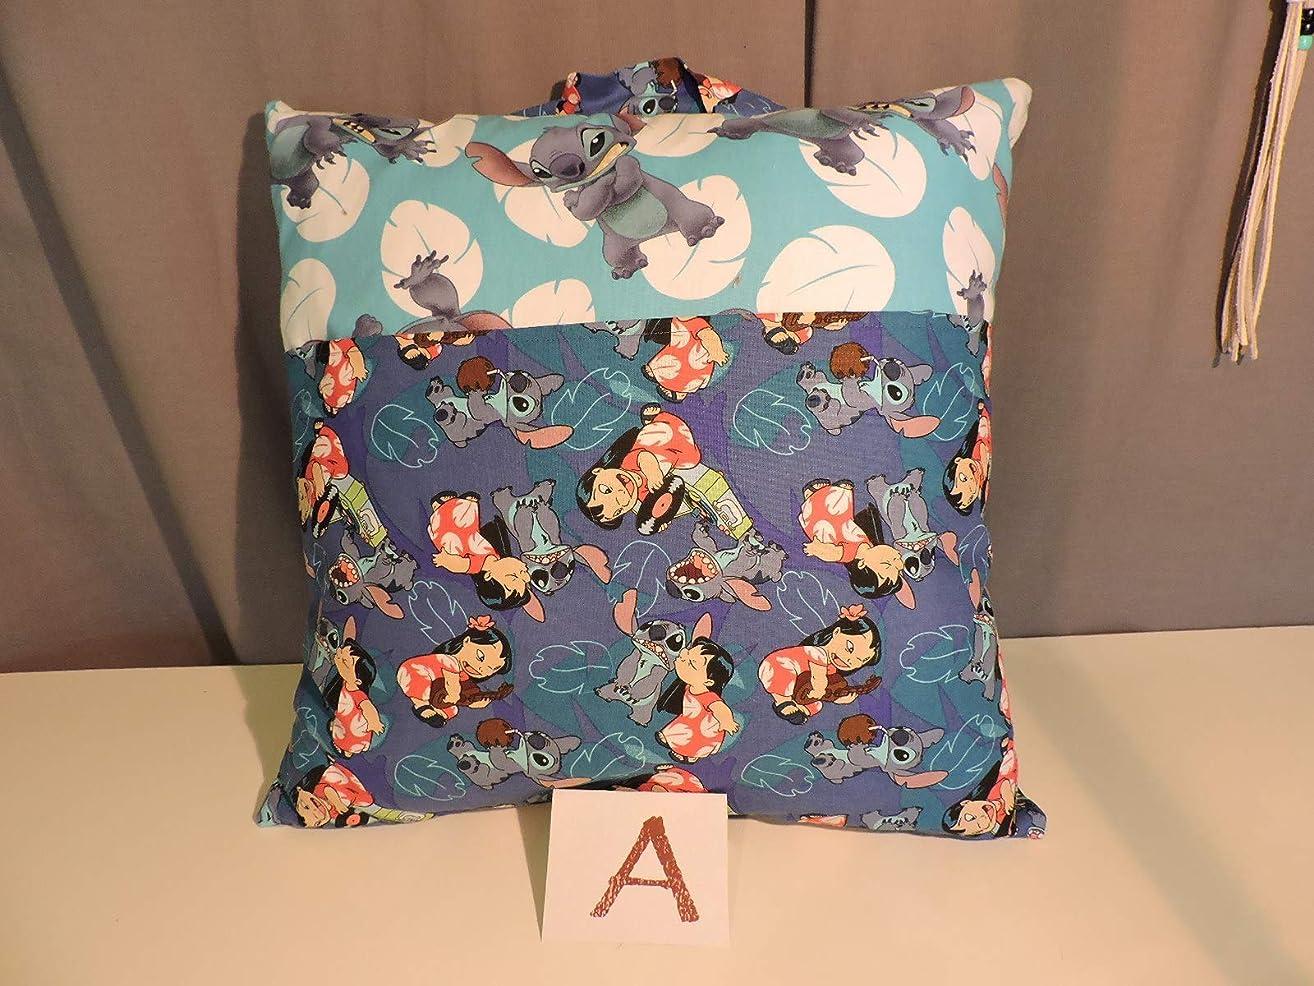 Lilo & Stitch Reader Pillow; Child's Pillow; Pocket Pillow - 16